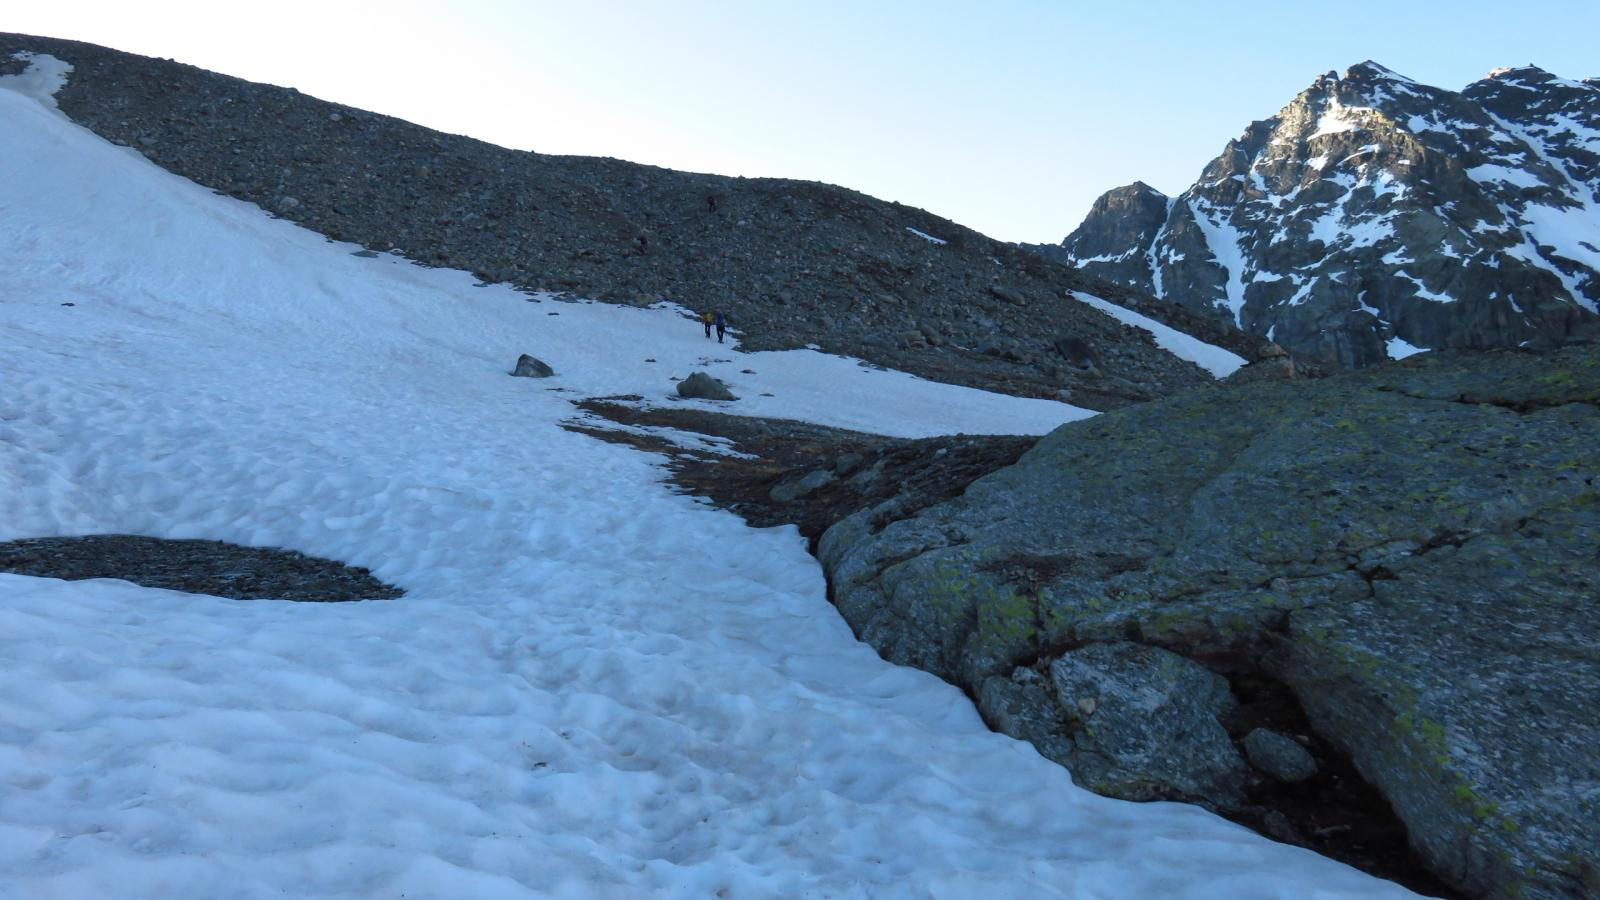 prime lingue di neve a quota 2700 m